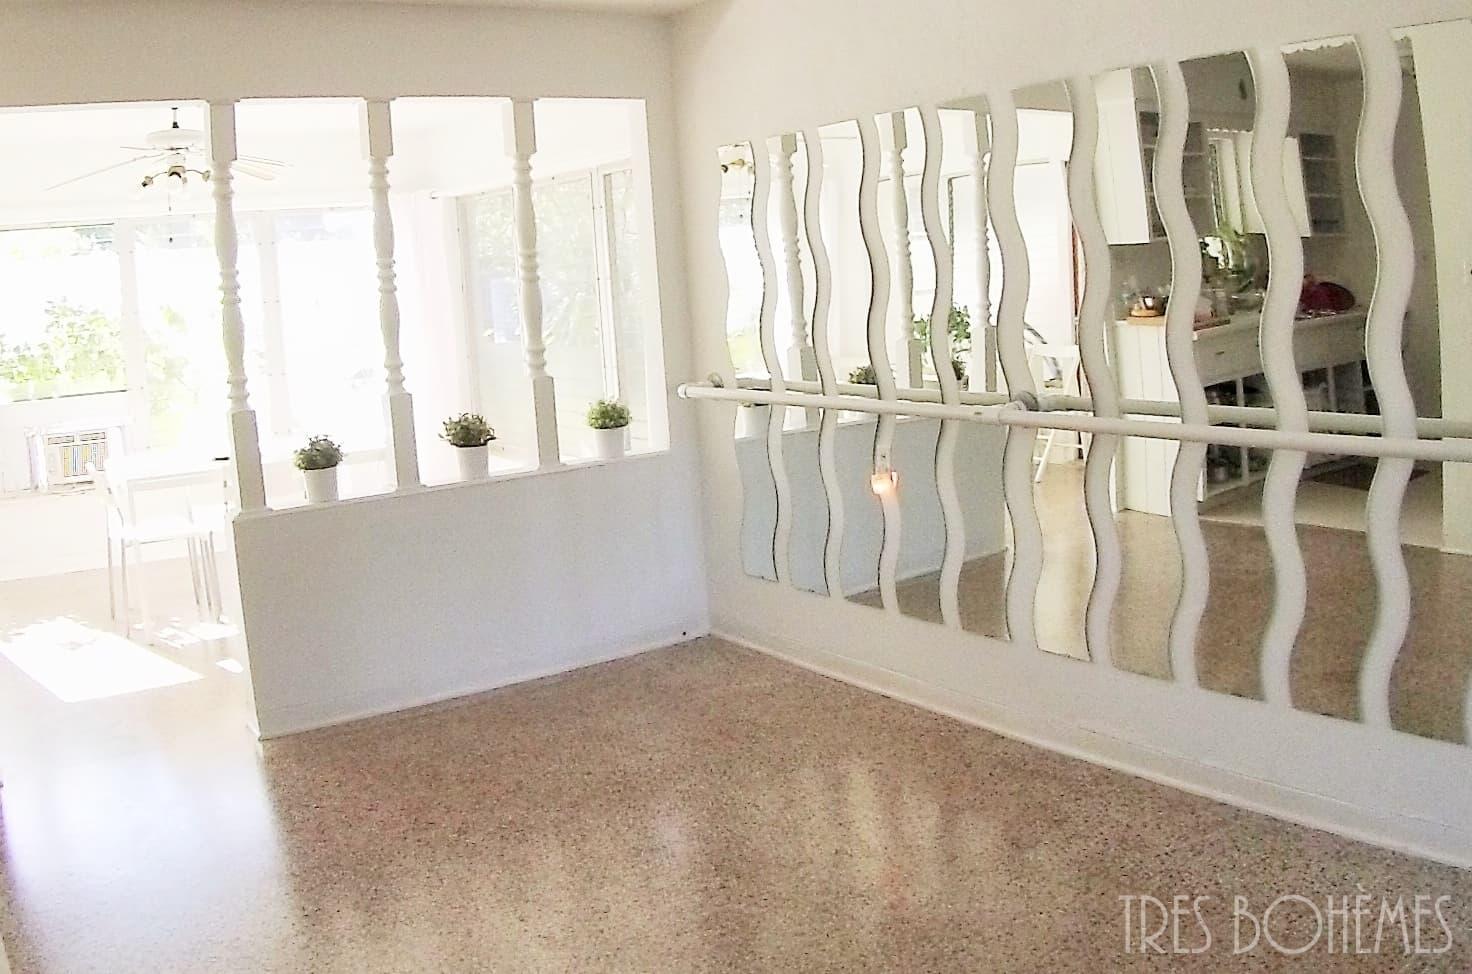 Dining Room Turned Ballet Dance Room | Tres Bohemes